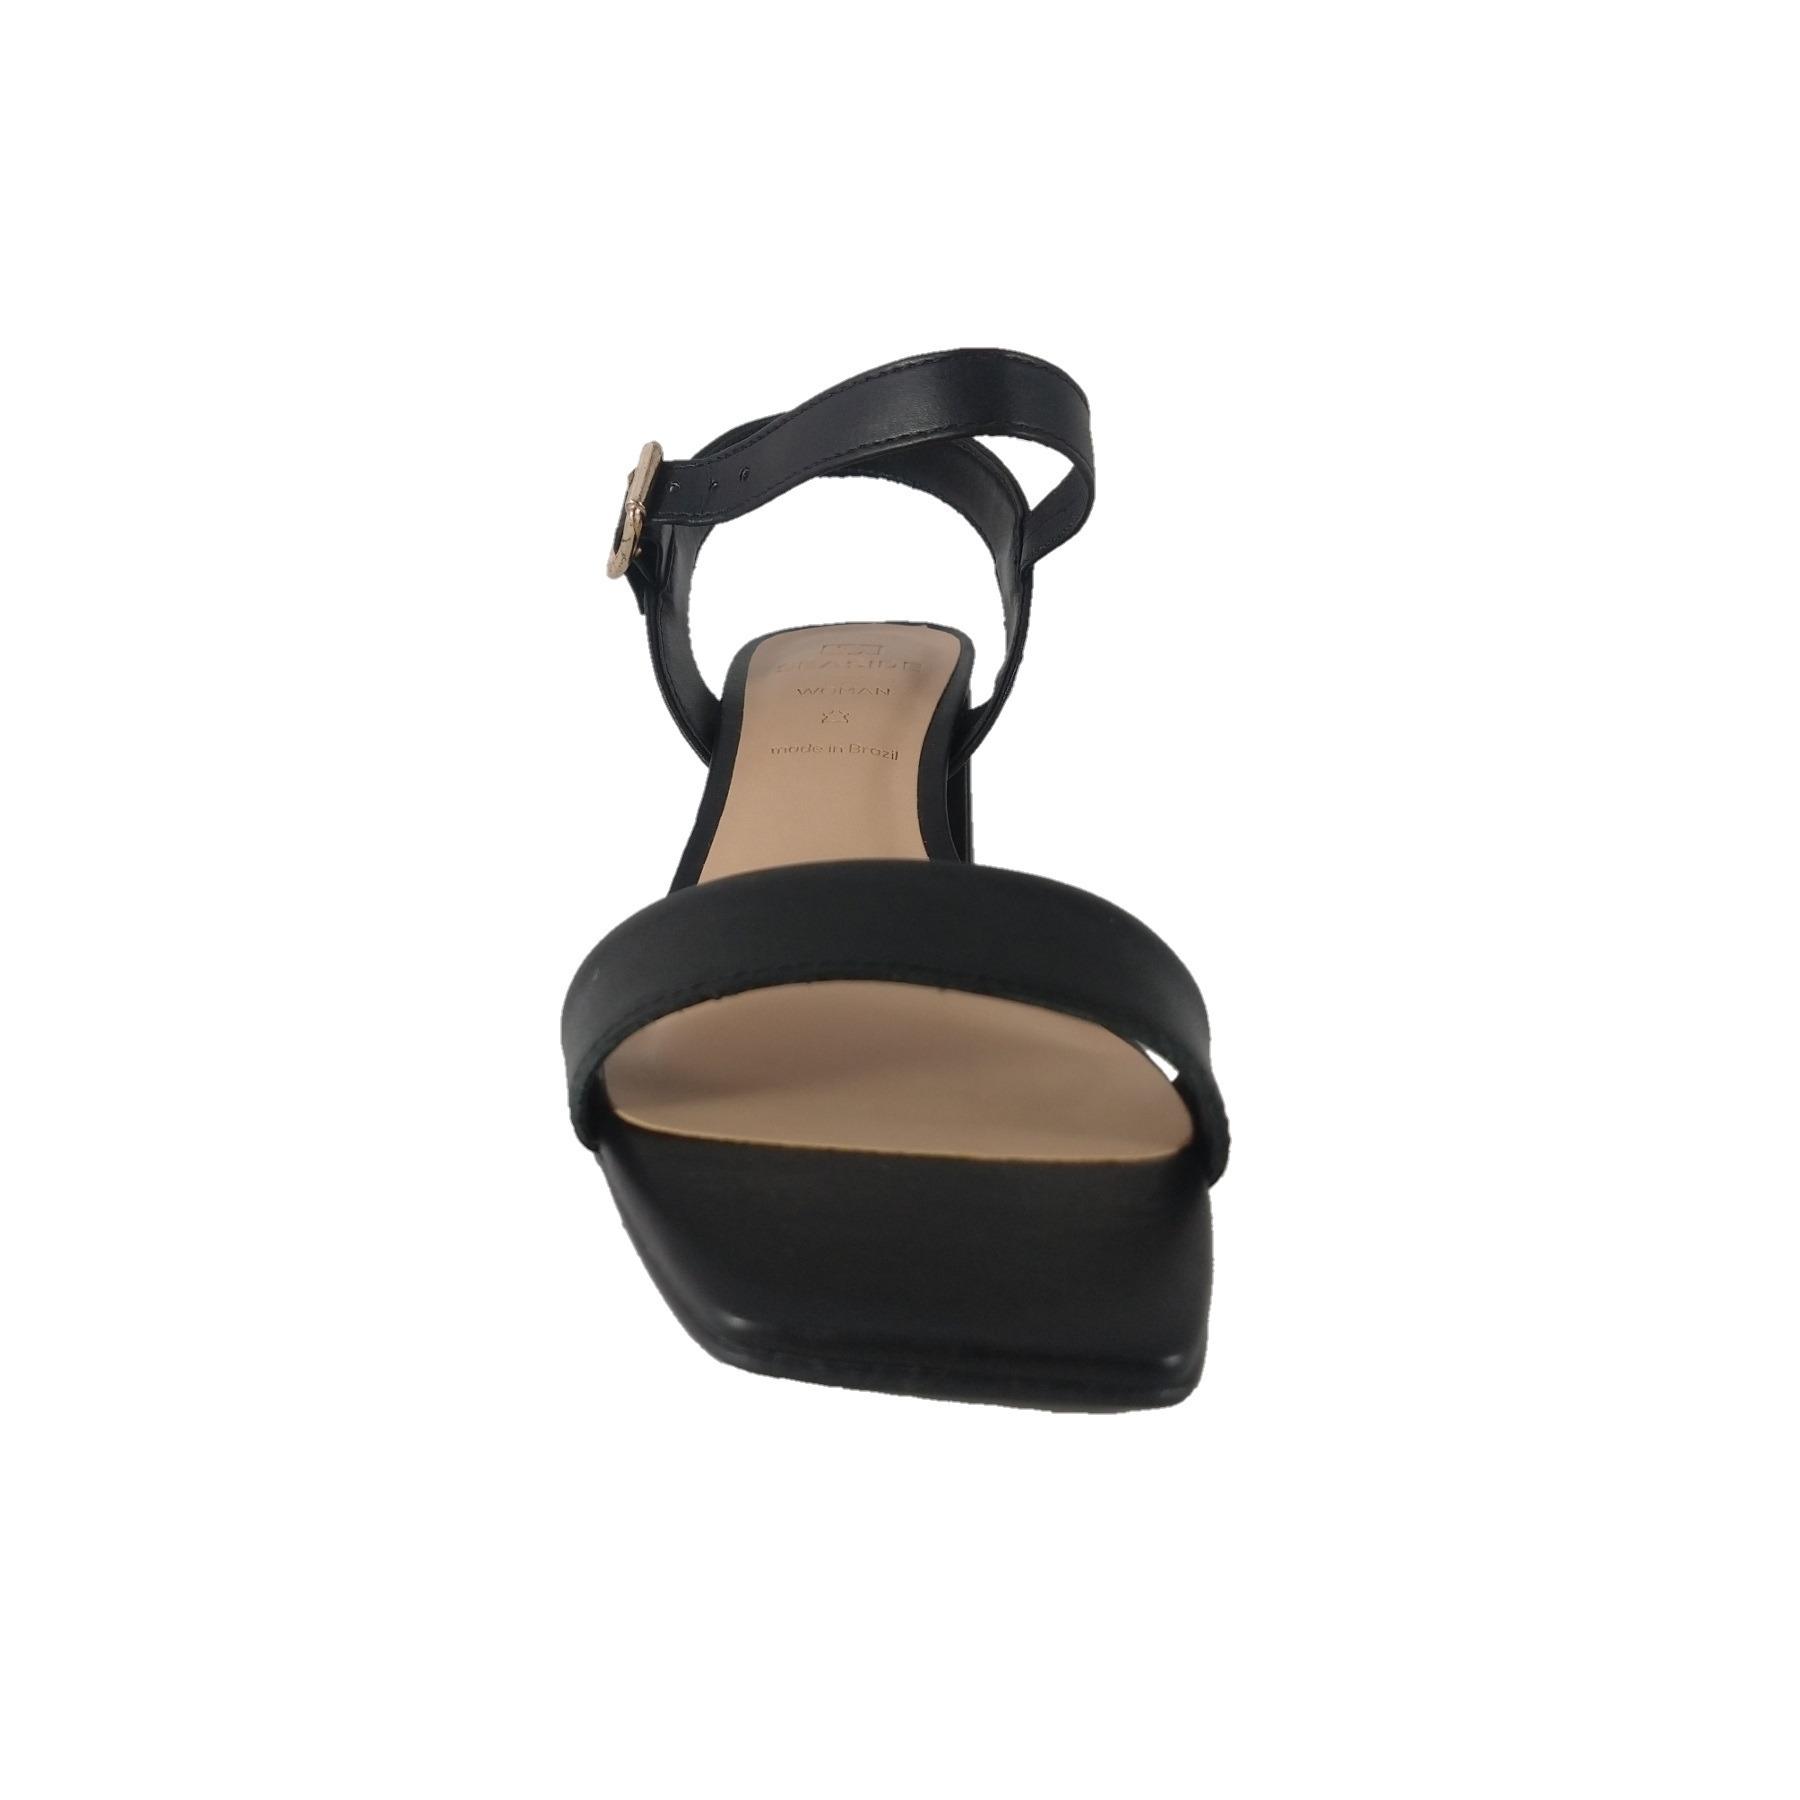 Sandálias Salto Bloco SapatoWeb Couro  - SAPATOWEB.COM